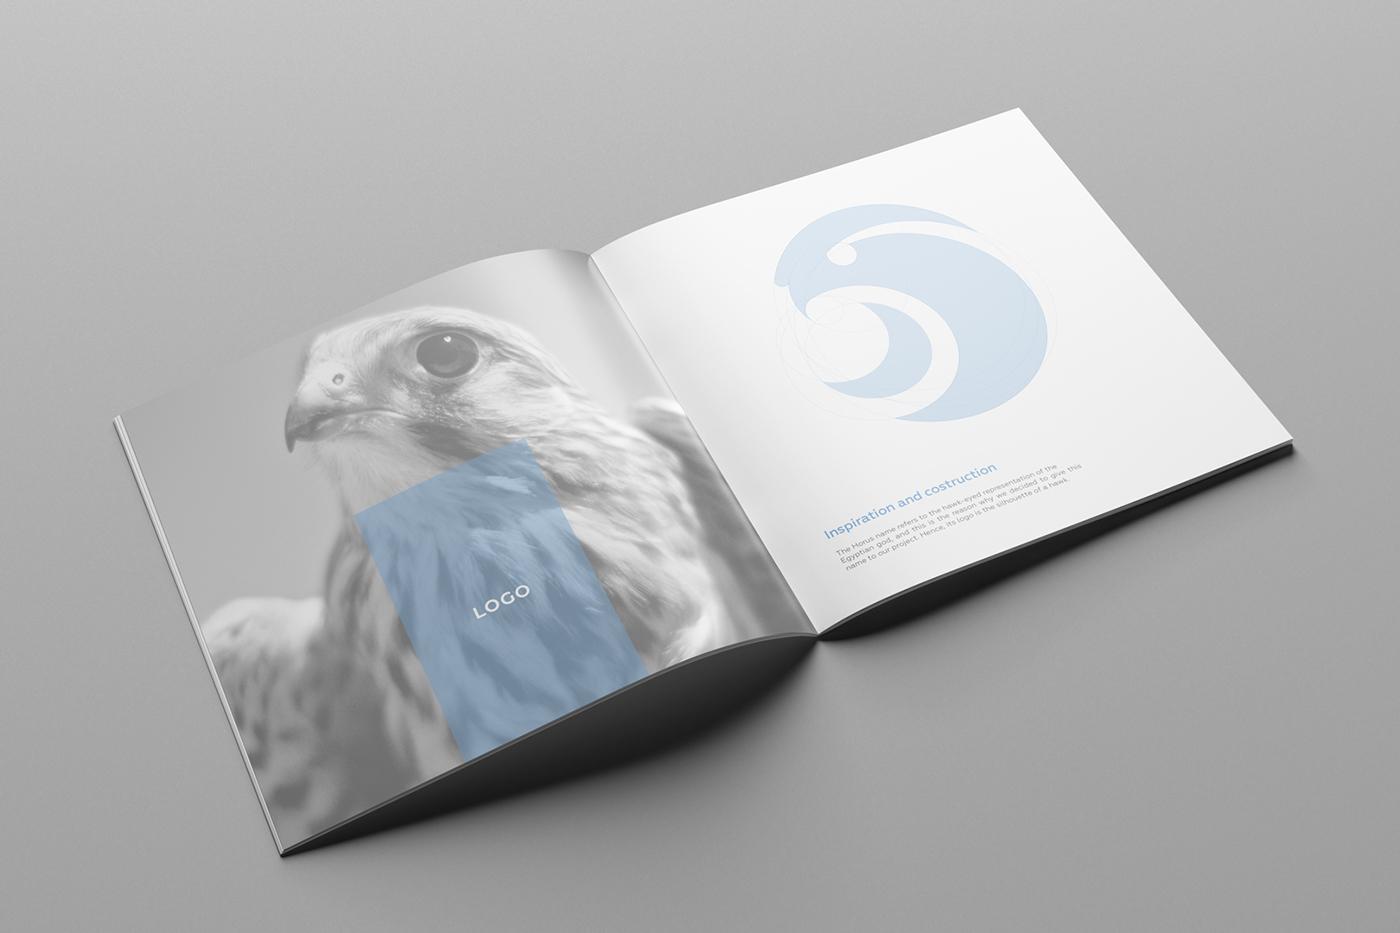 HORUS埃及神鹰盲人视障品牌与画册设计-Martina Cavalieri